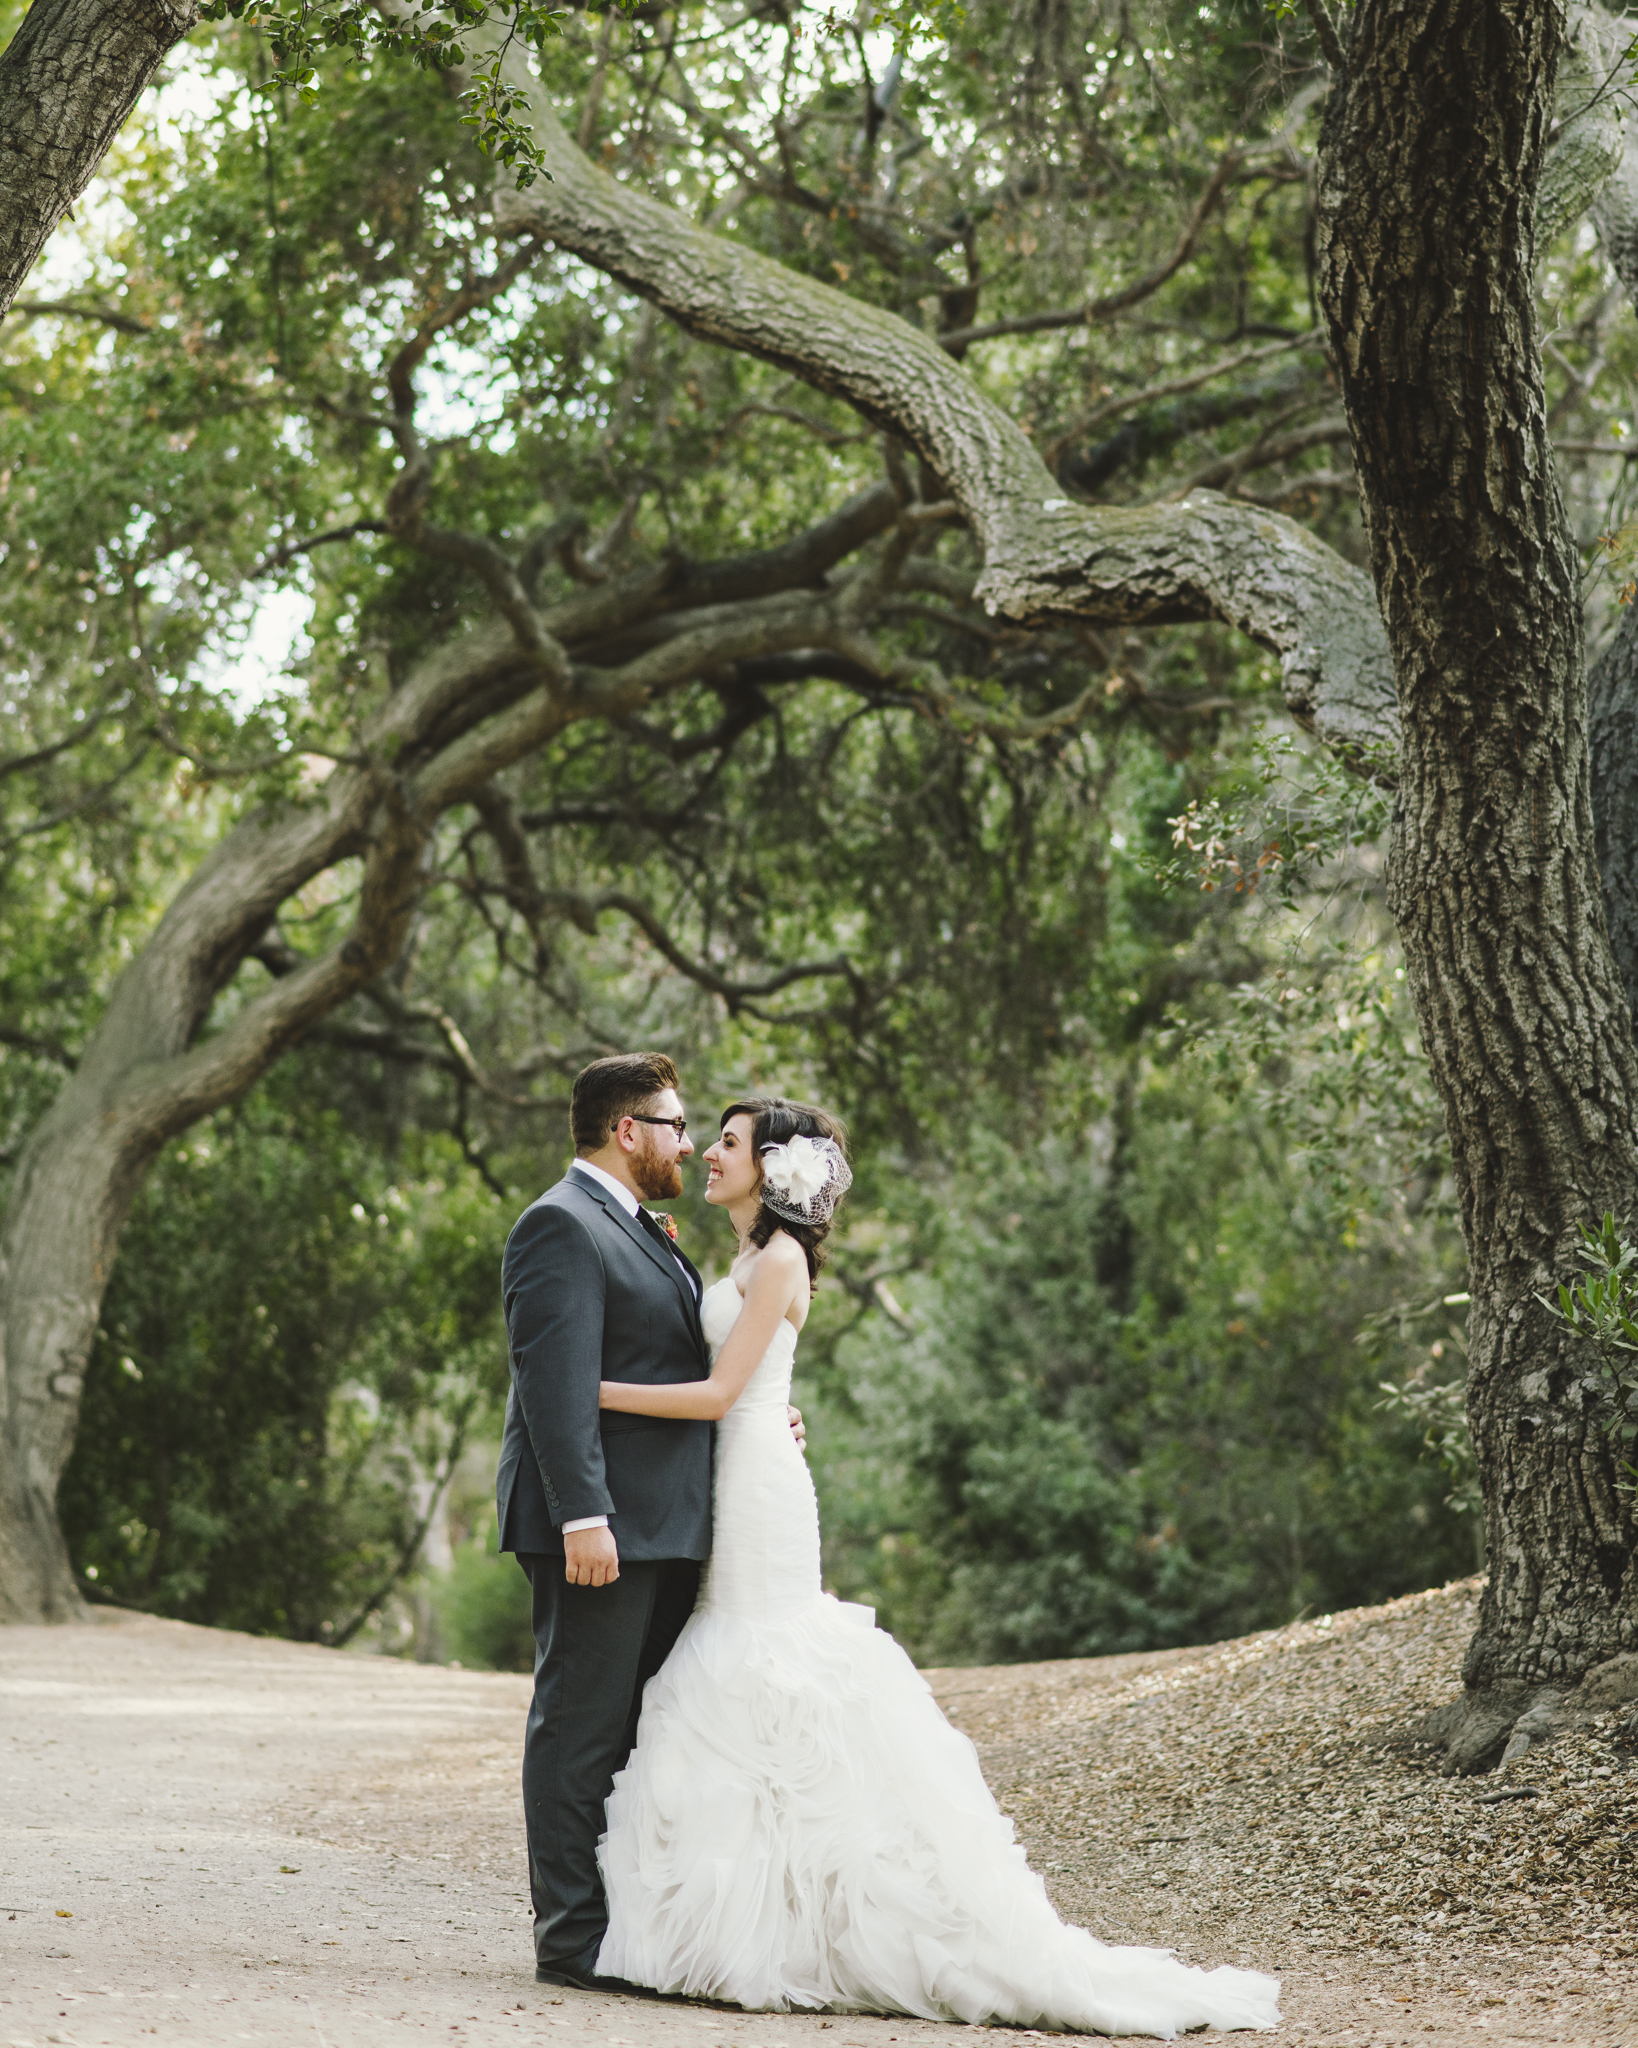 Isaiah & Taylor Photography - Los Angeles Lifestyle Wedding Photographer-23.jpg